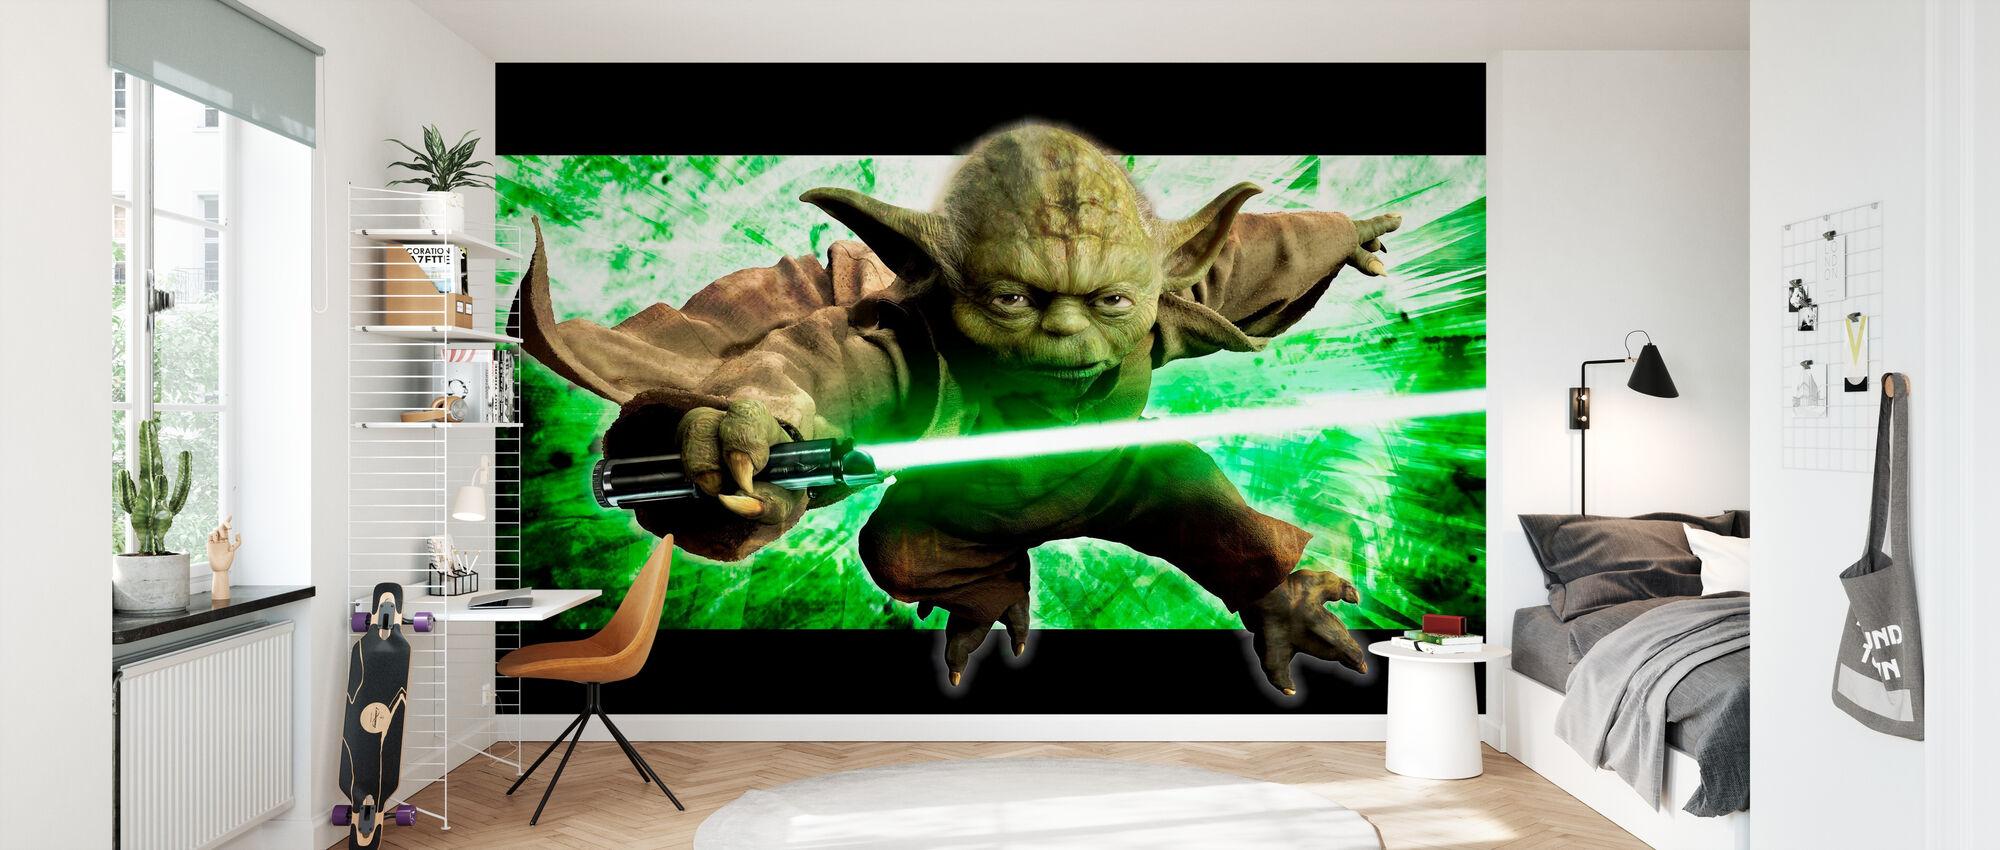 Star Wars - Yoda i aksjon - Tapet - Barnerom